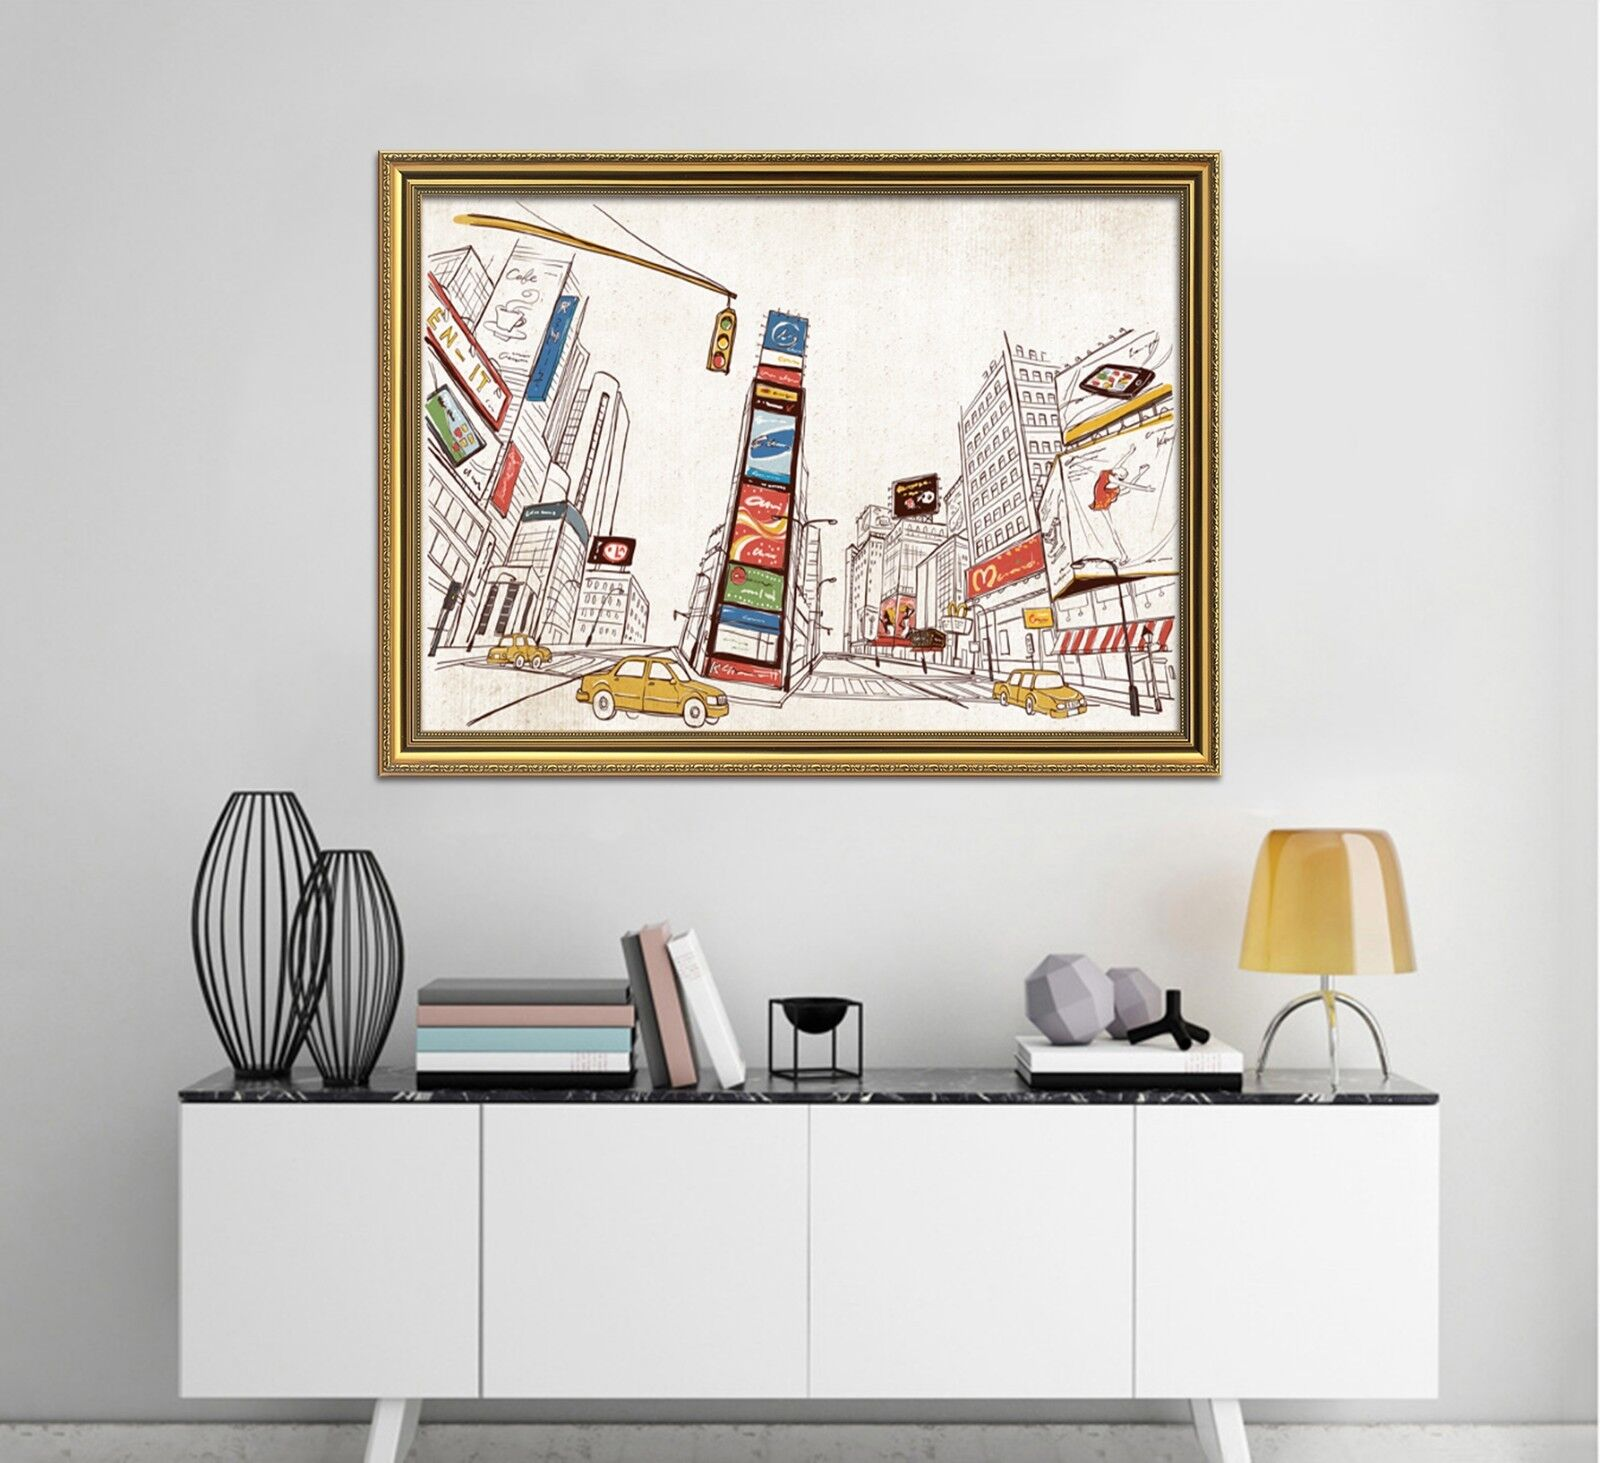 3D Downtown Street Car 2 Framed Poster Home Decor Print Painting Art WALLPAPER